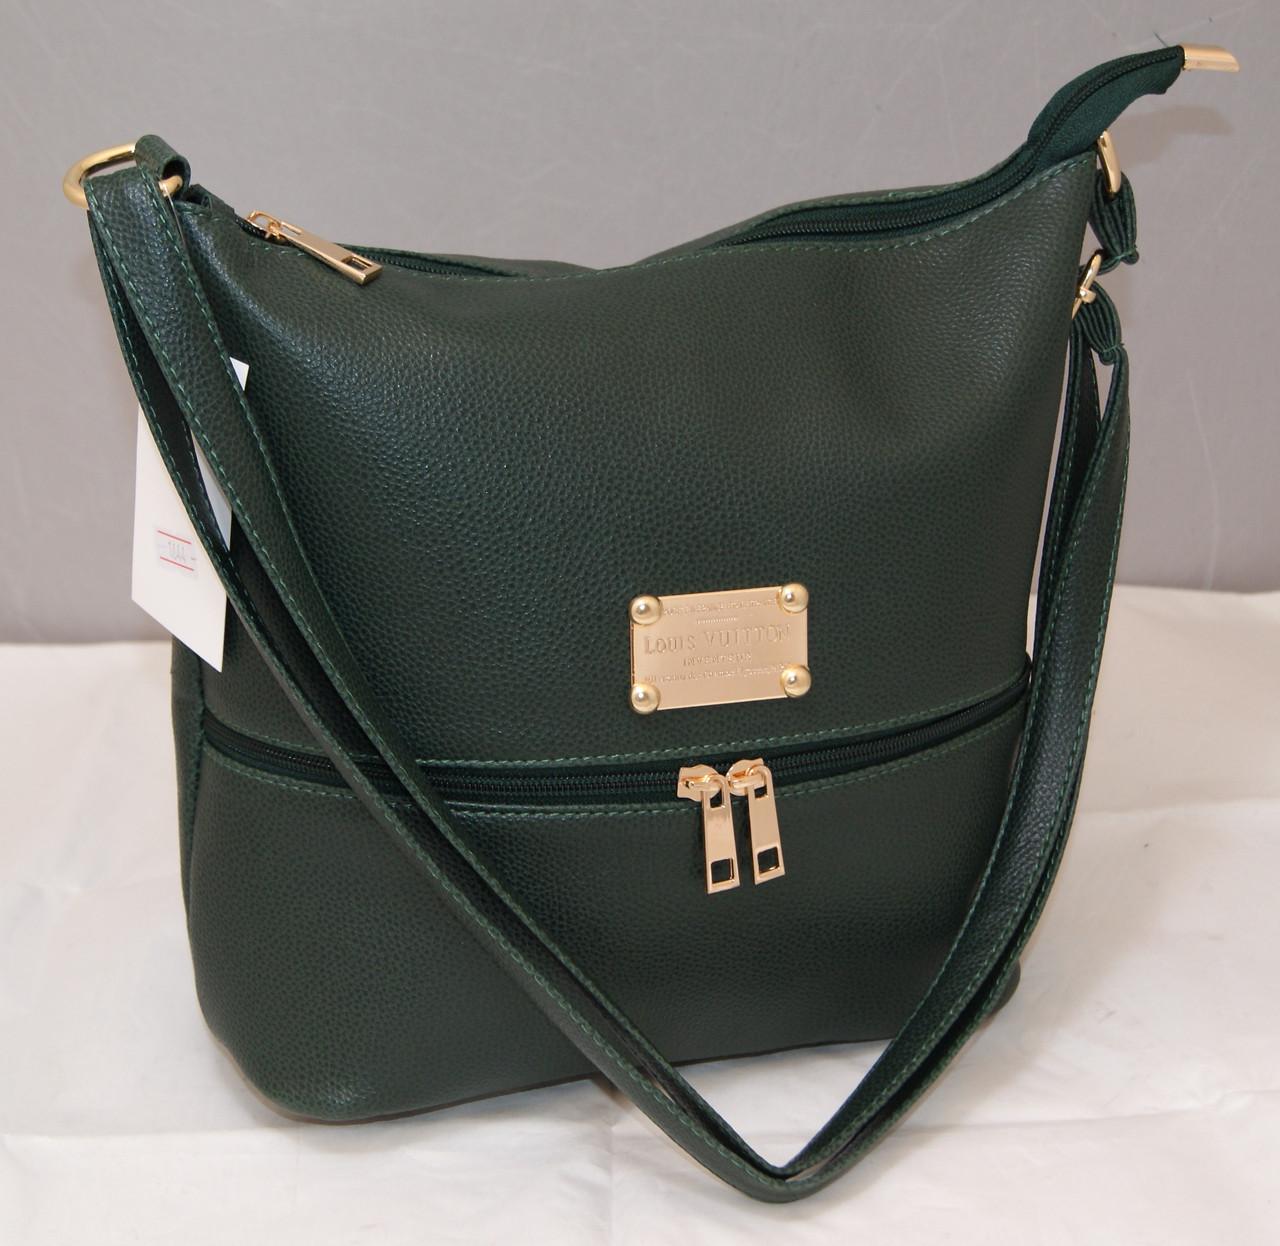 Женская сумка Louis Vuitton, зеленый Луи Виттон  продажа, цена в ... e53bc7dd886